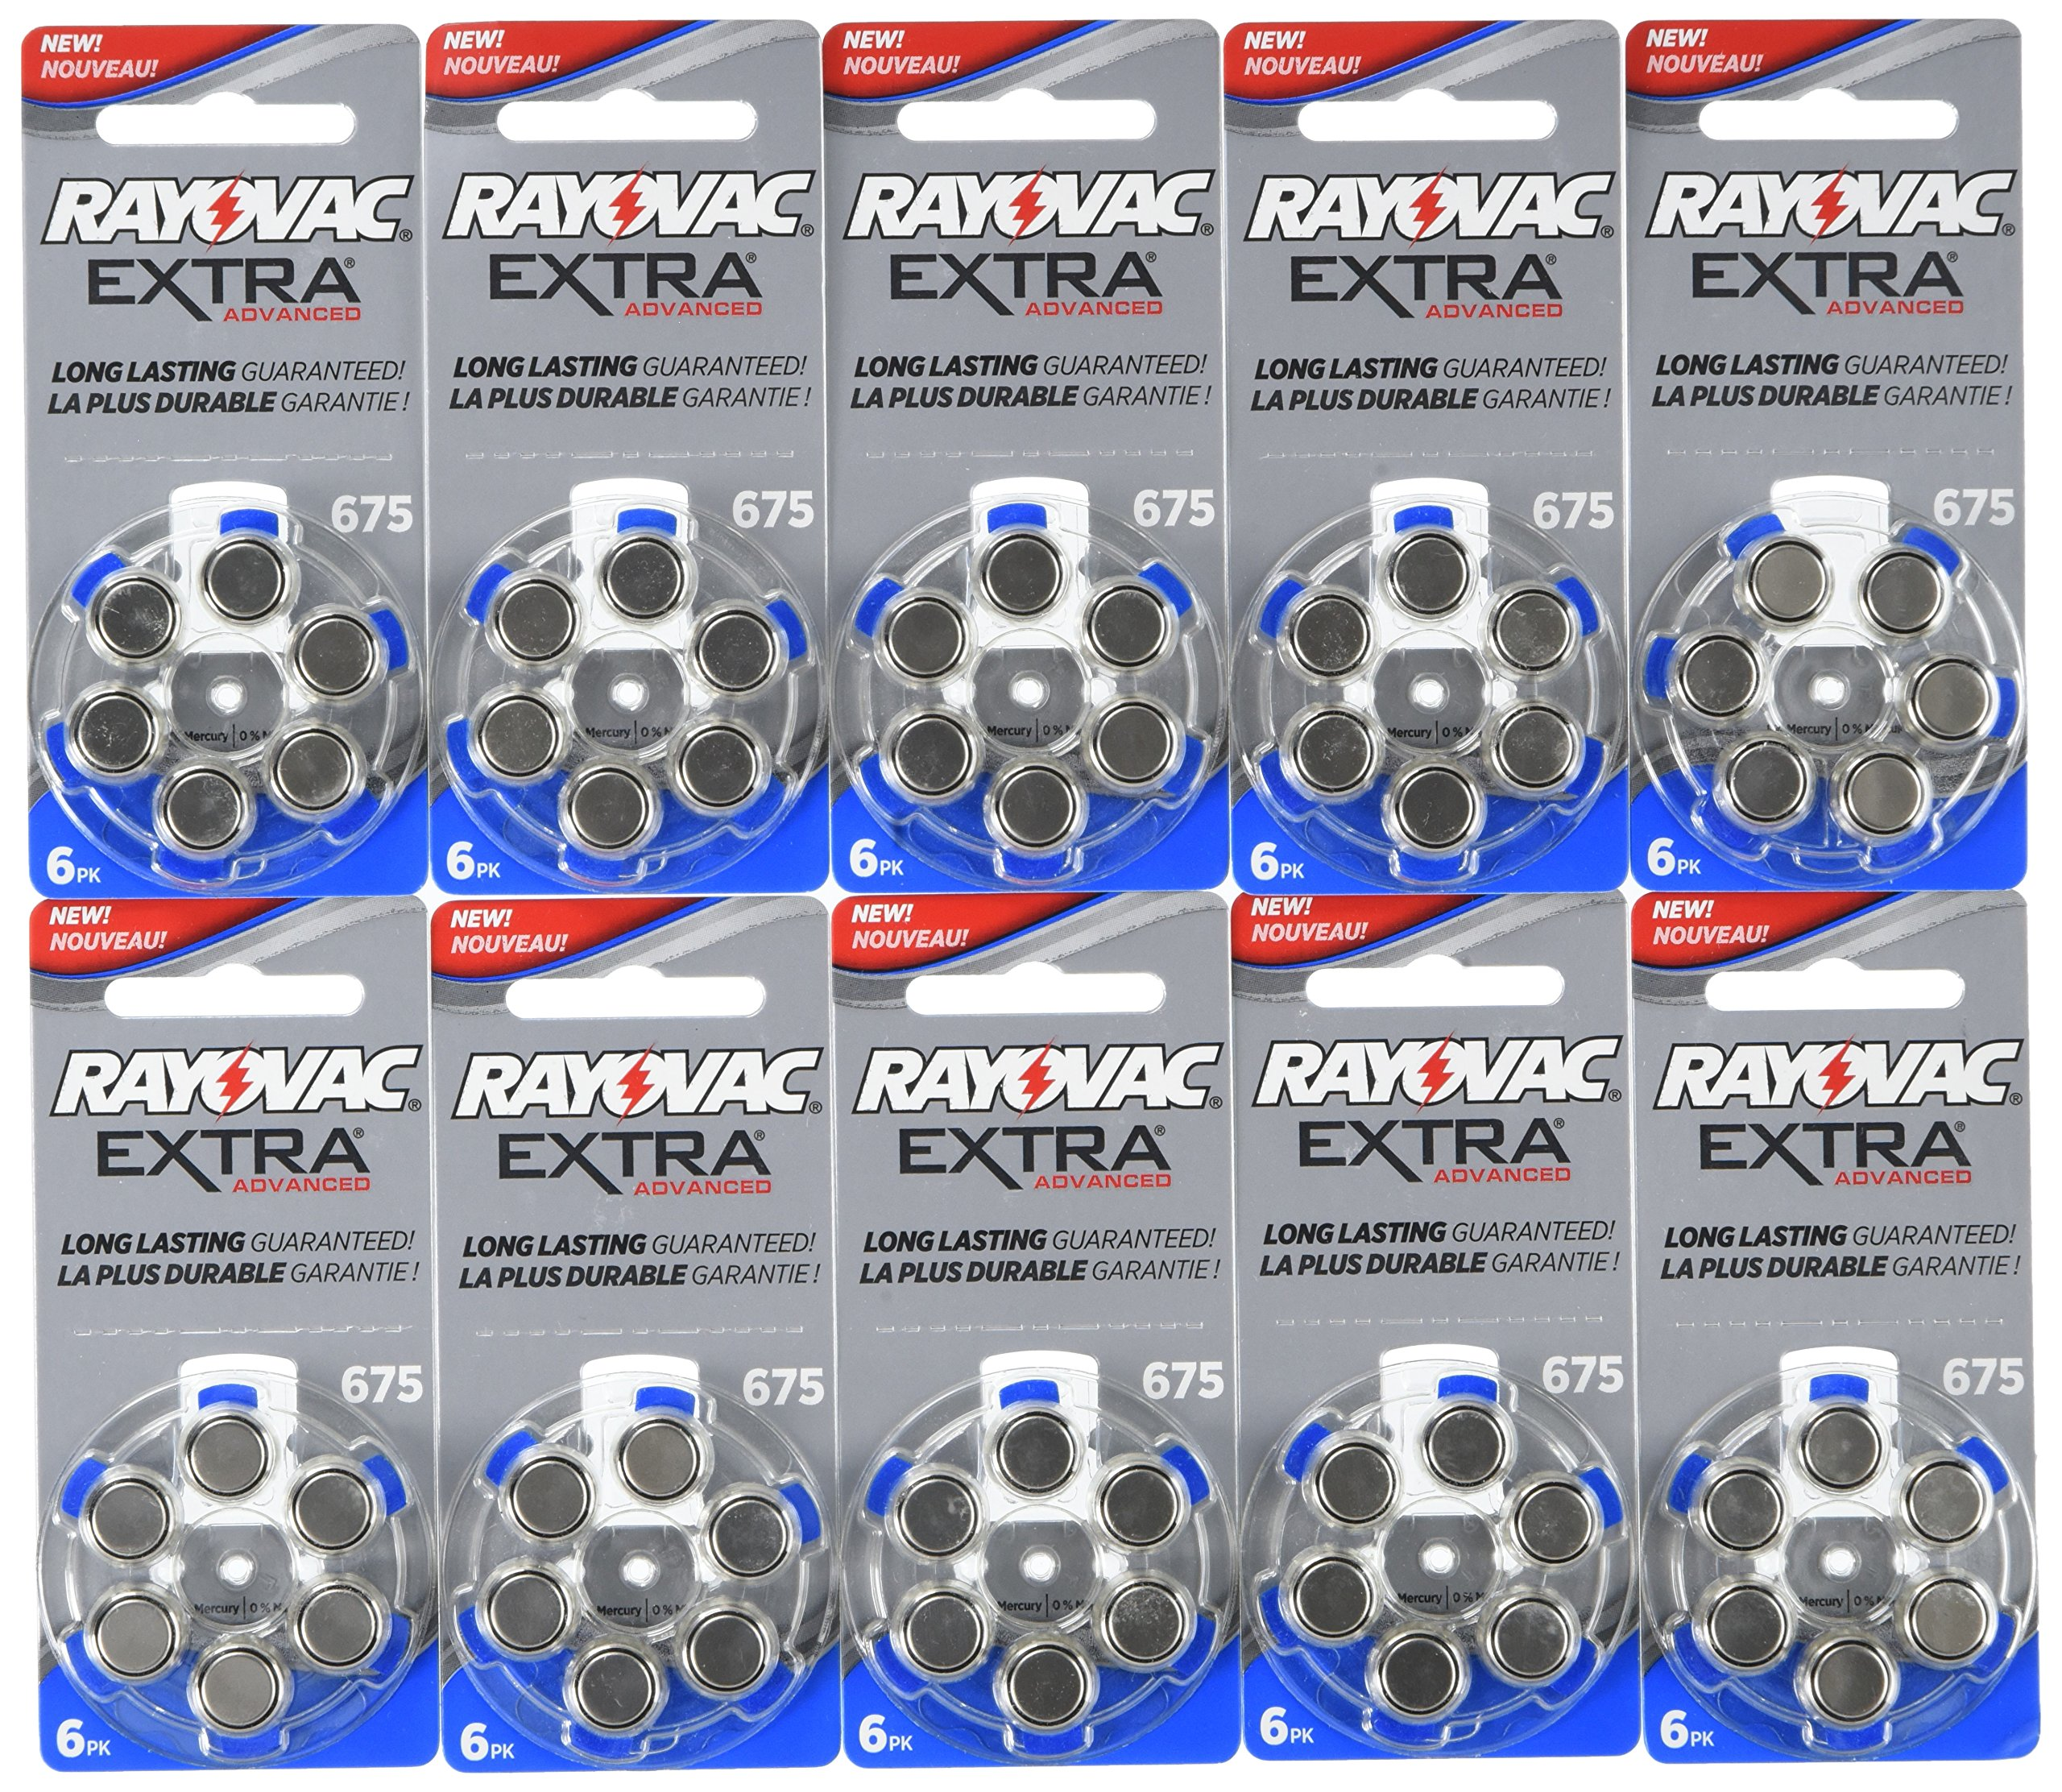 60 Rayovac Extra Mercury Free Hearing Aid Batteries Size: 675 by Rayovac